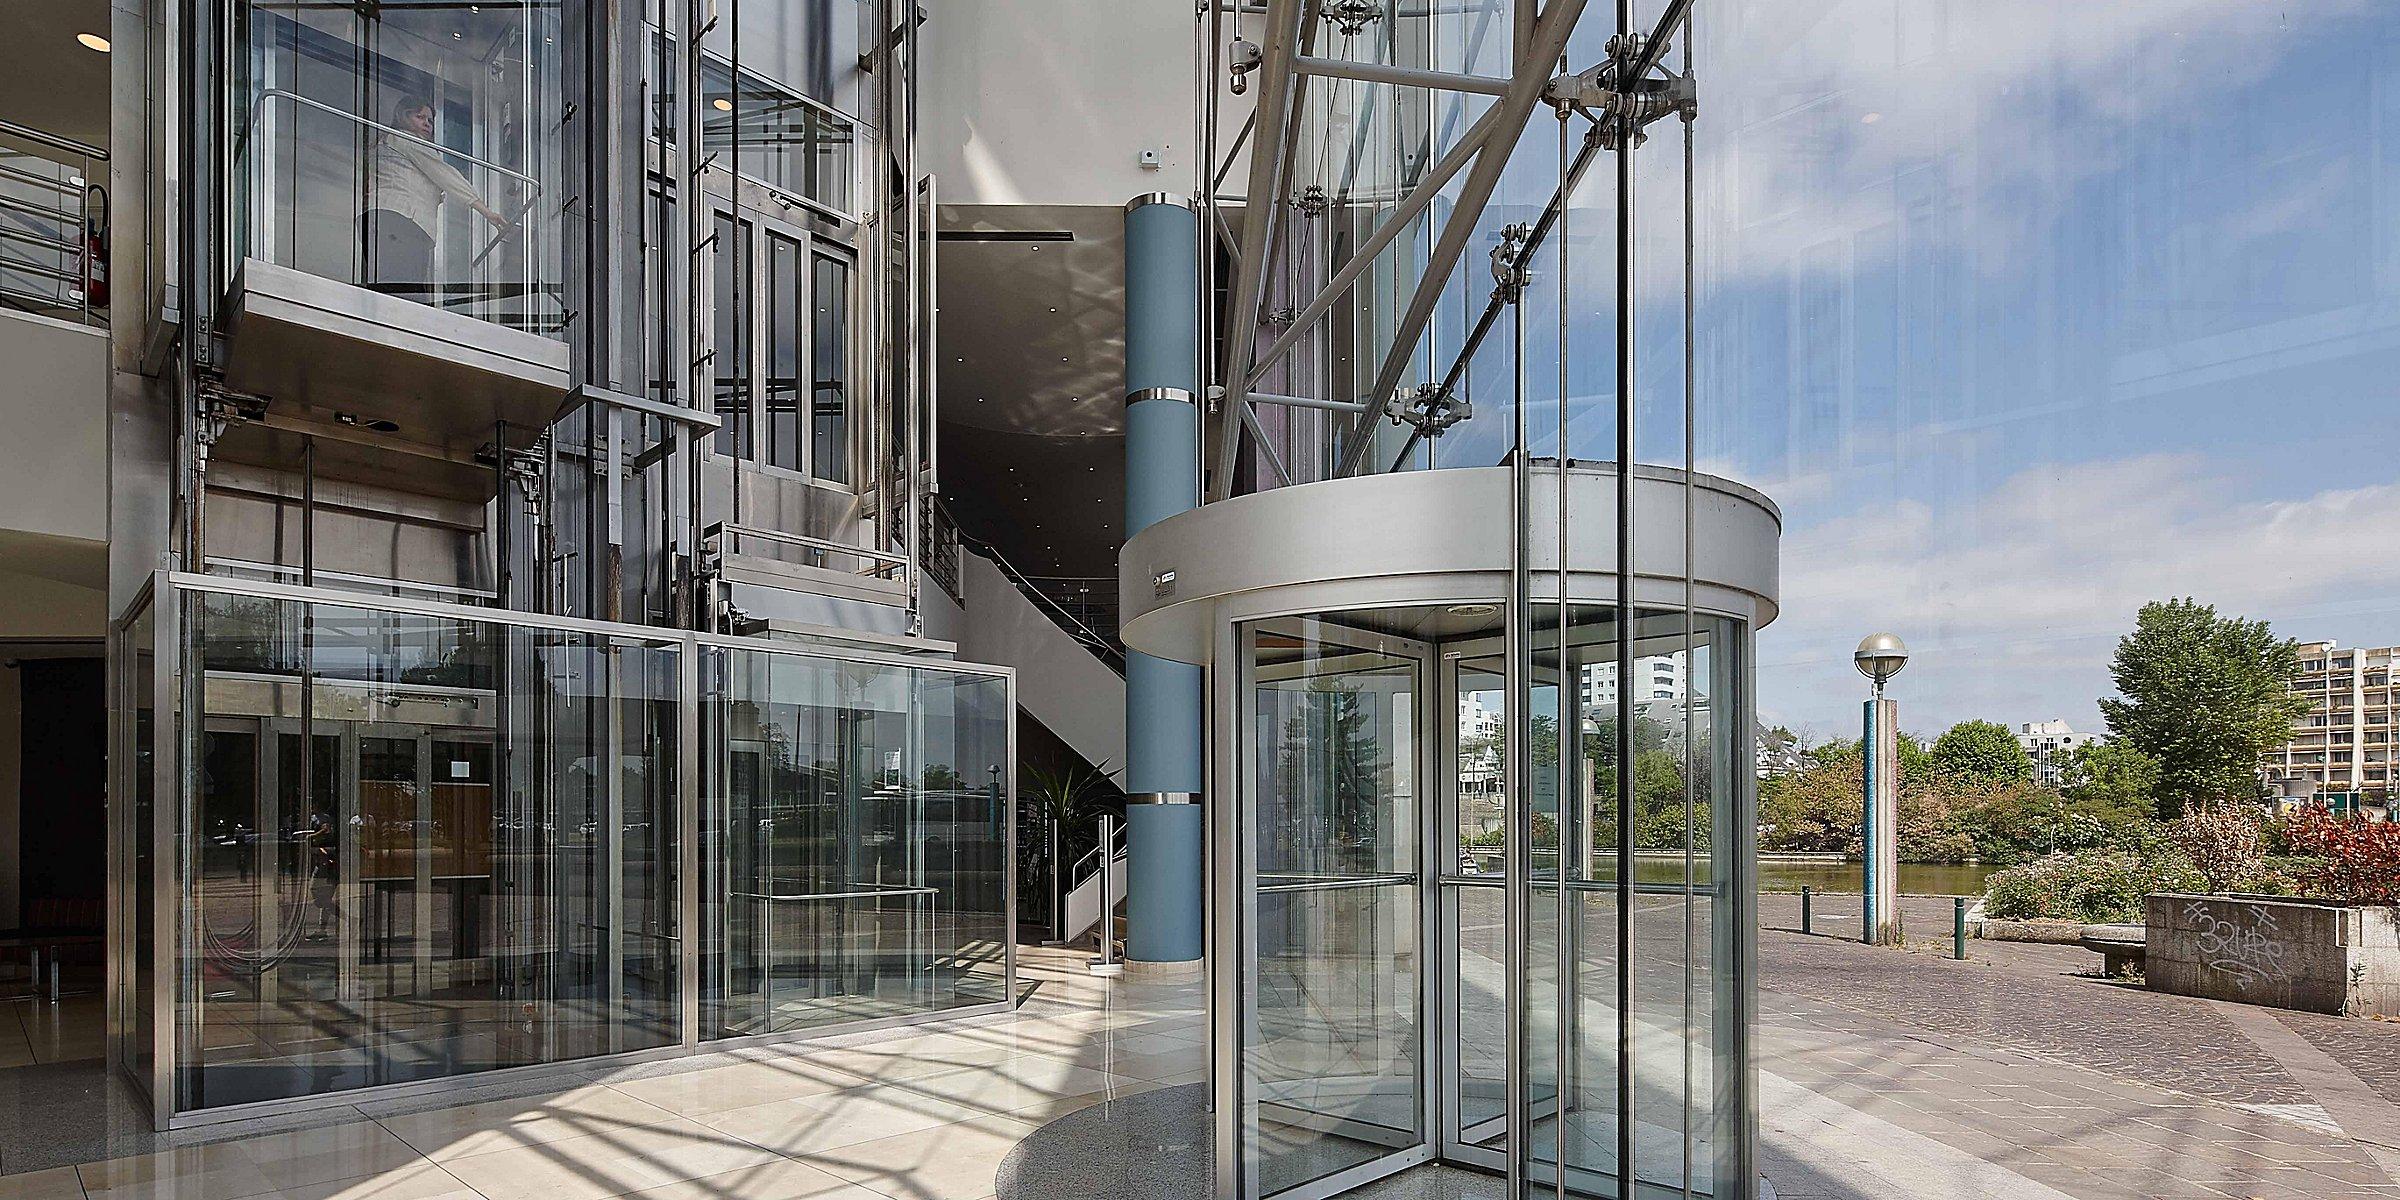 Noisy Le Grand Architecture hotels near disneyland paris | holiday inn paris - marne la